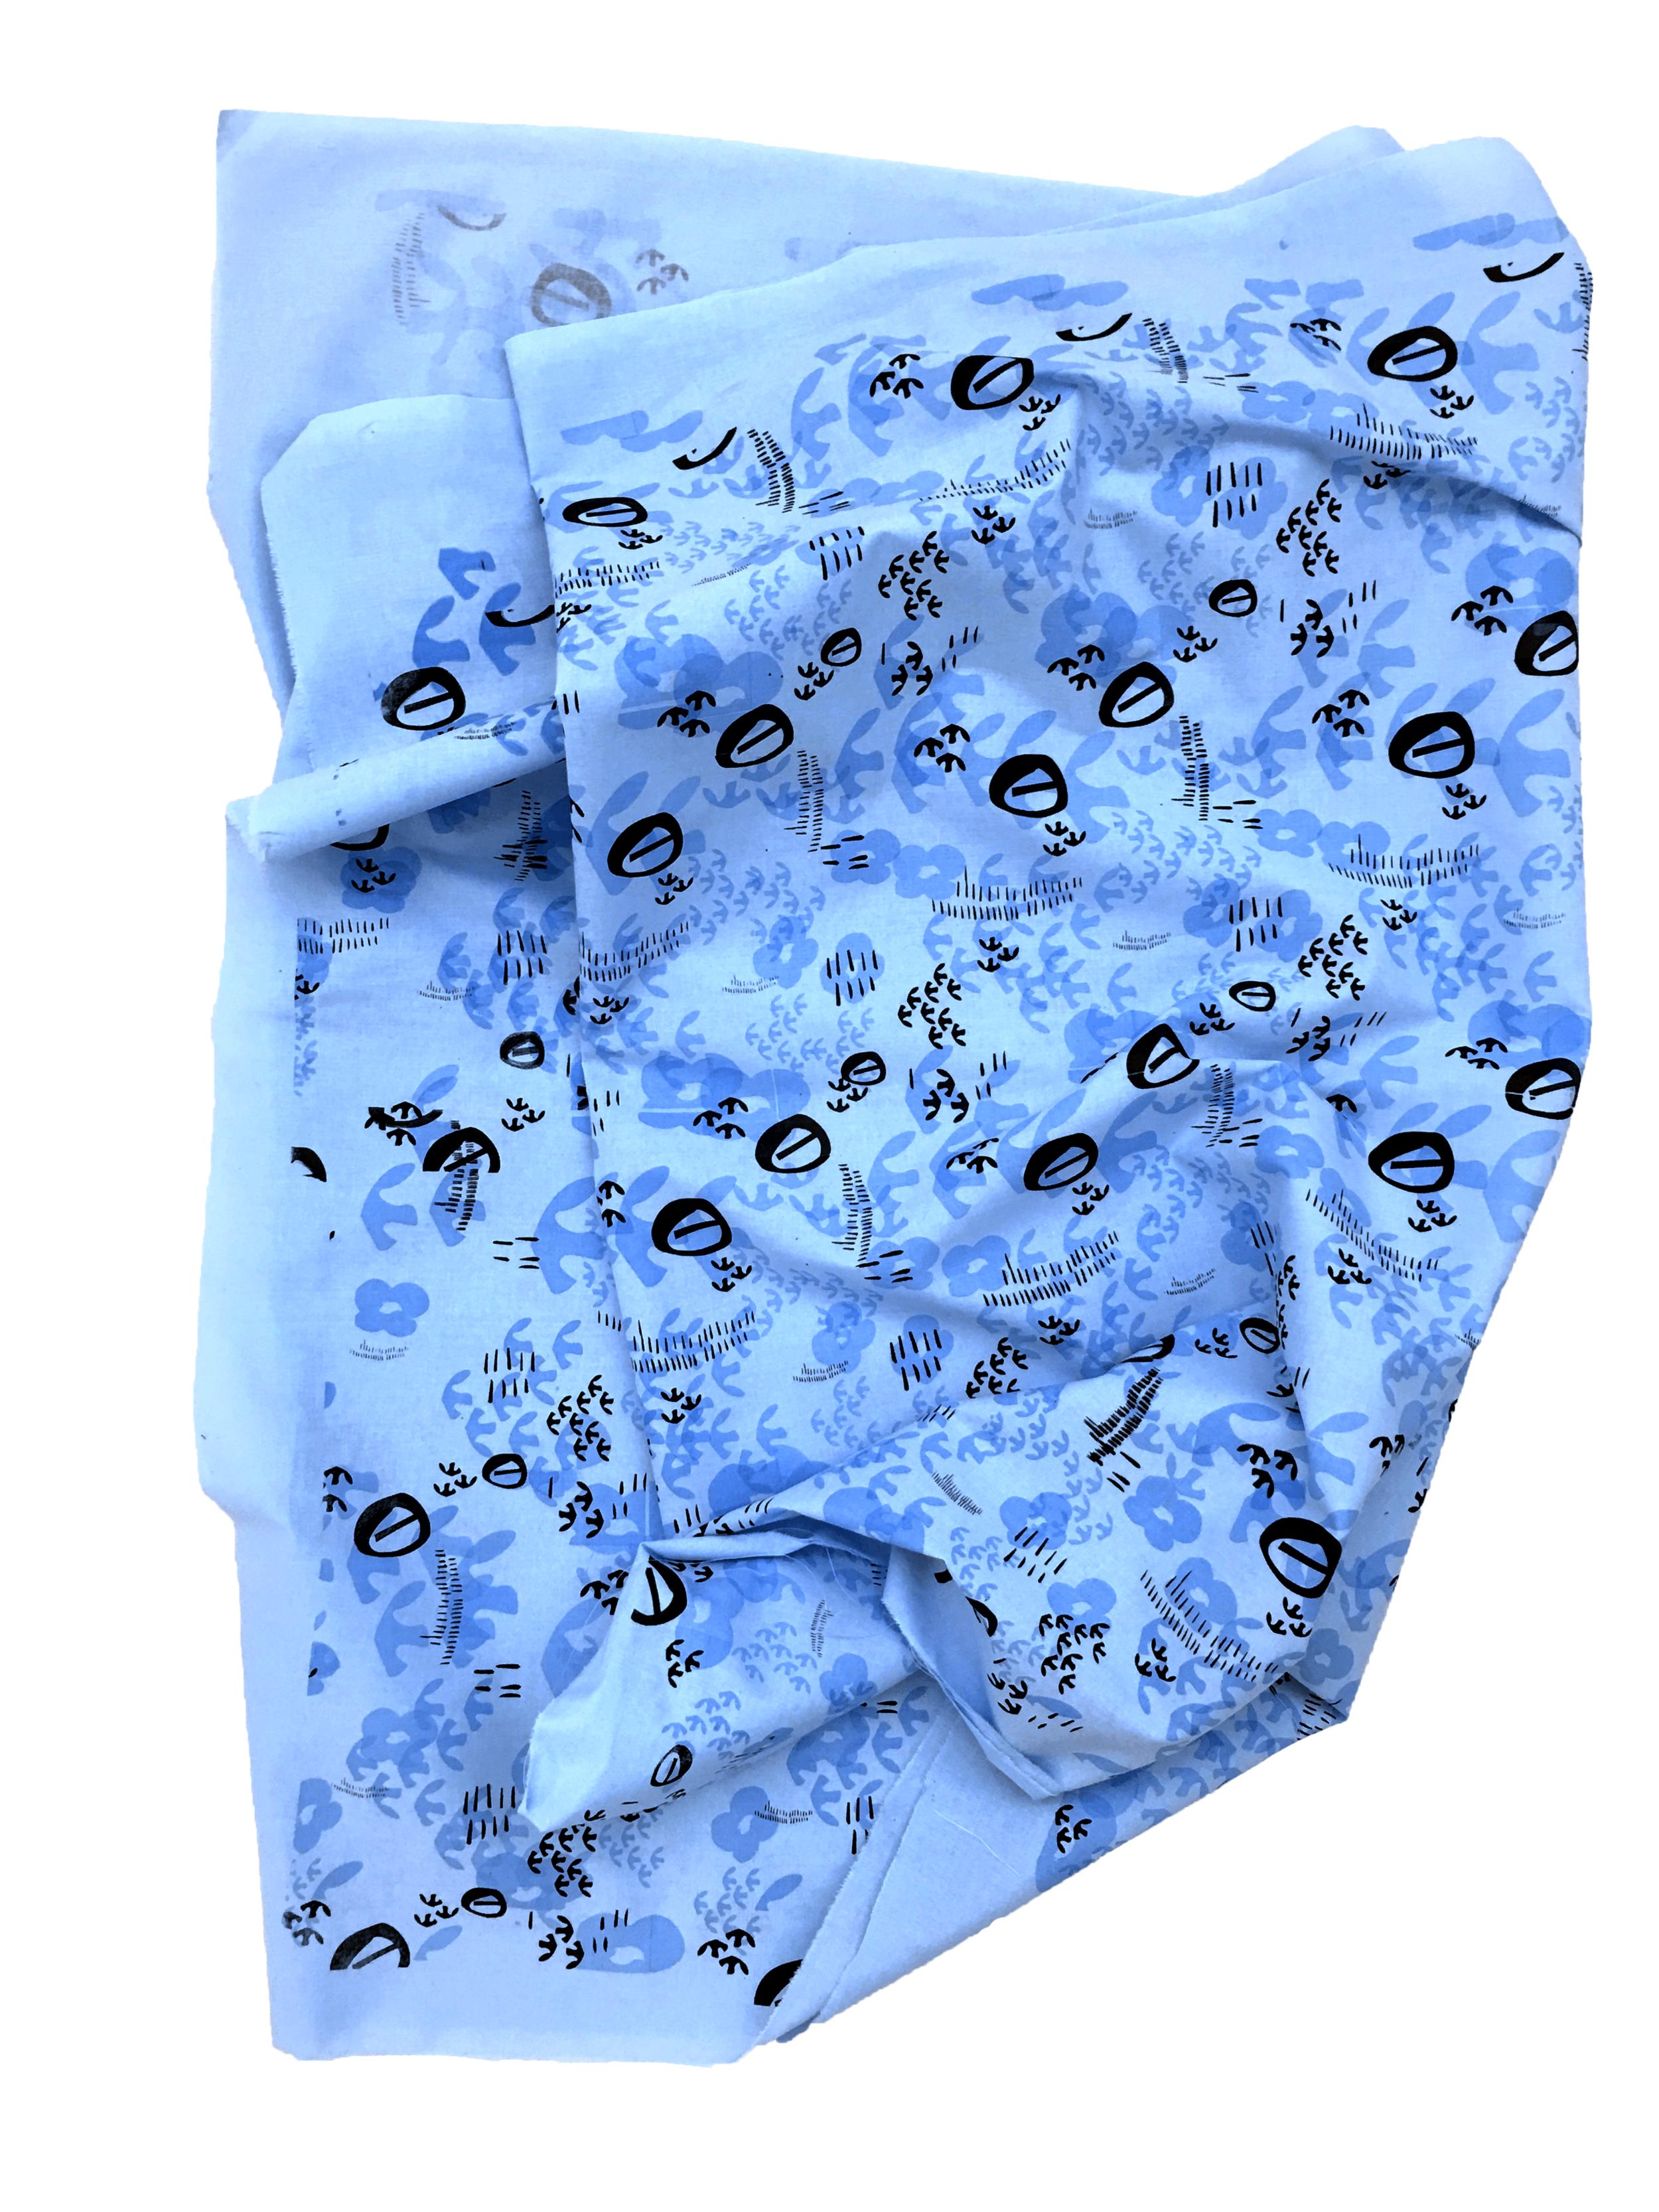 Final Screen Printed Fabric